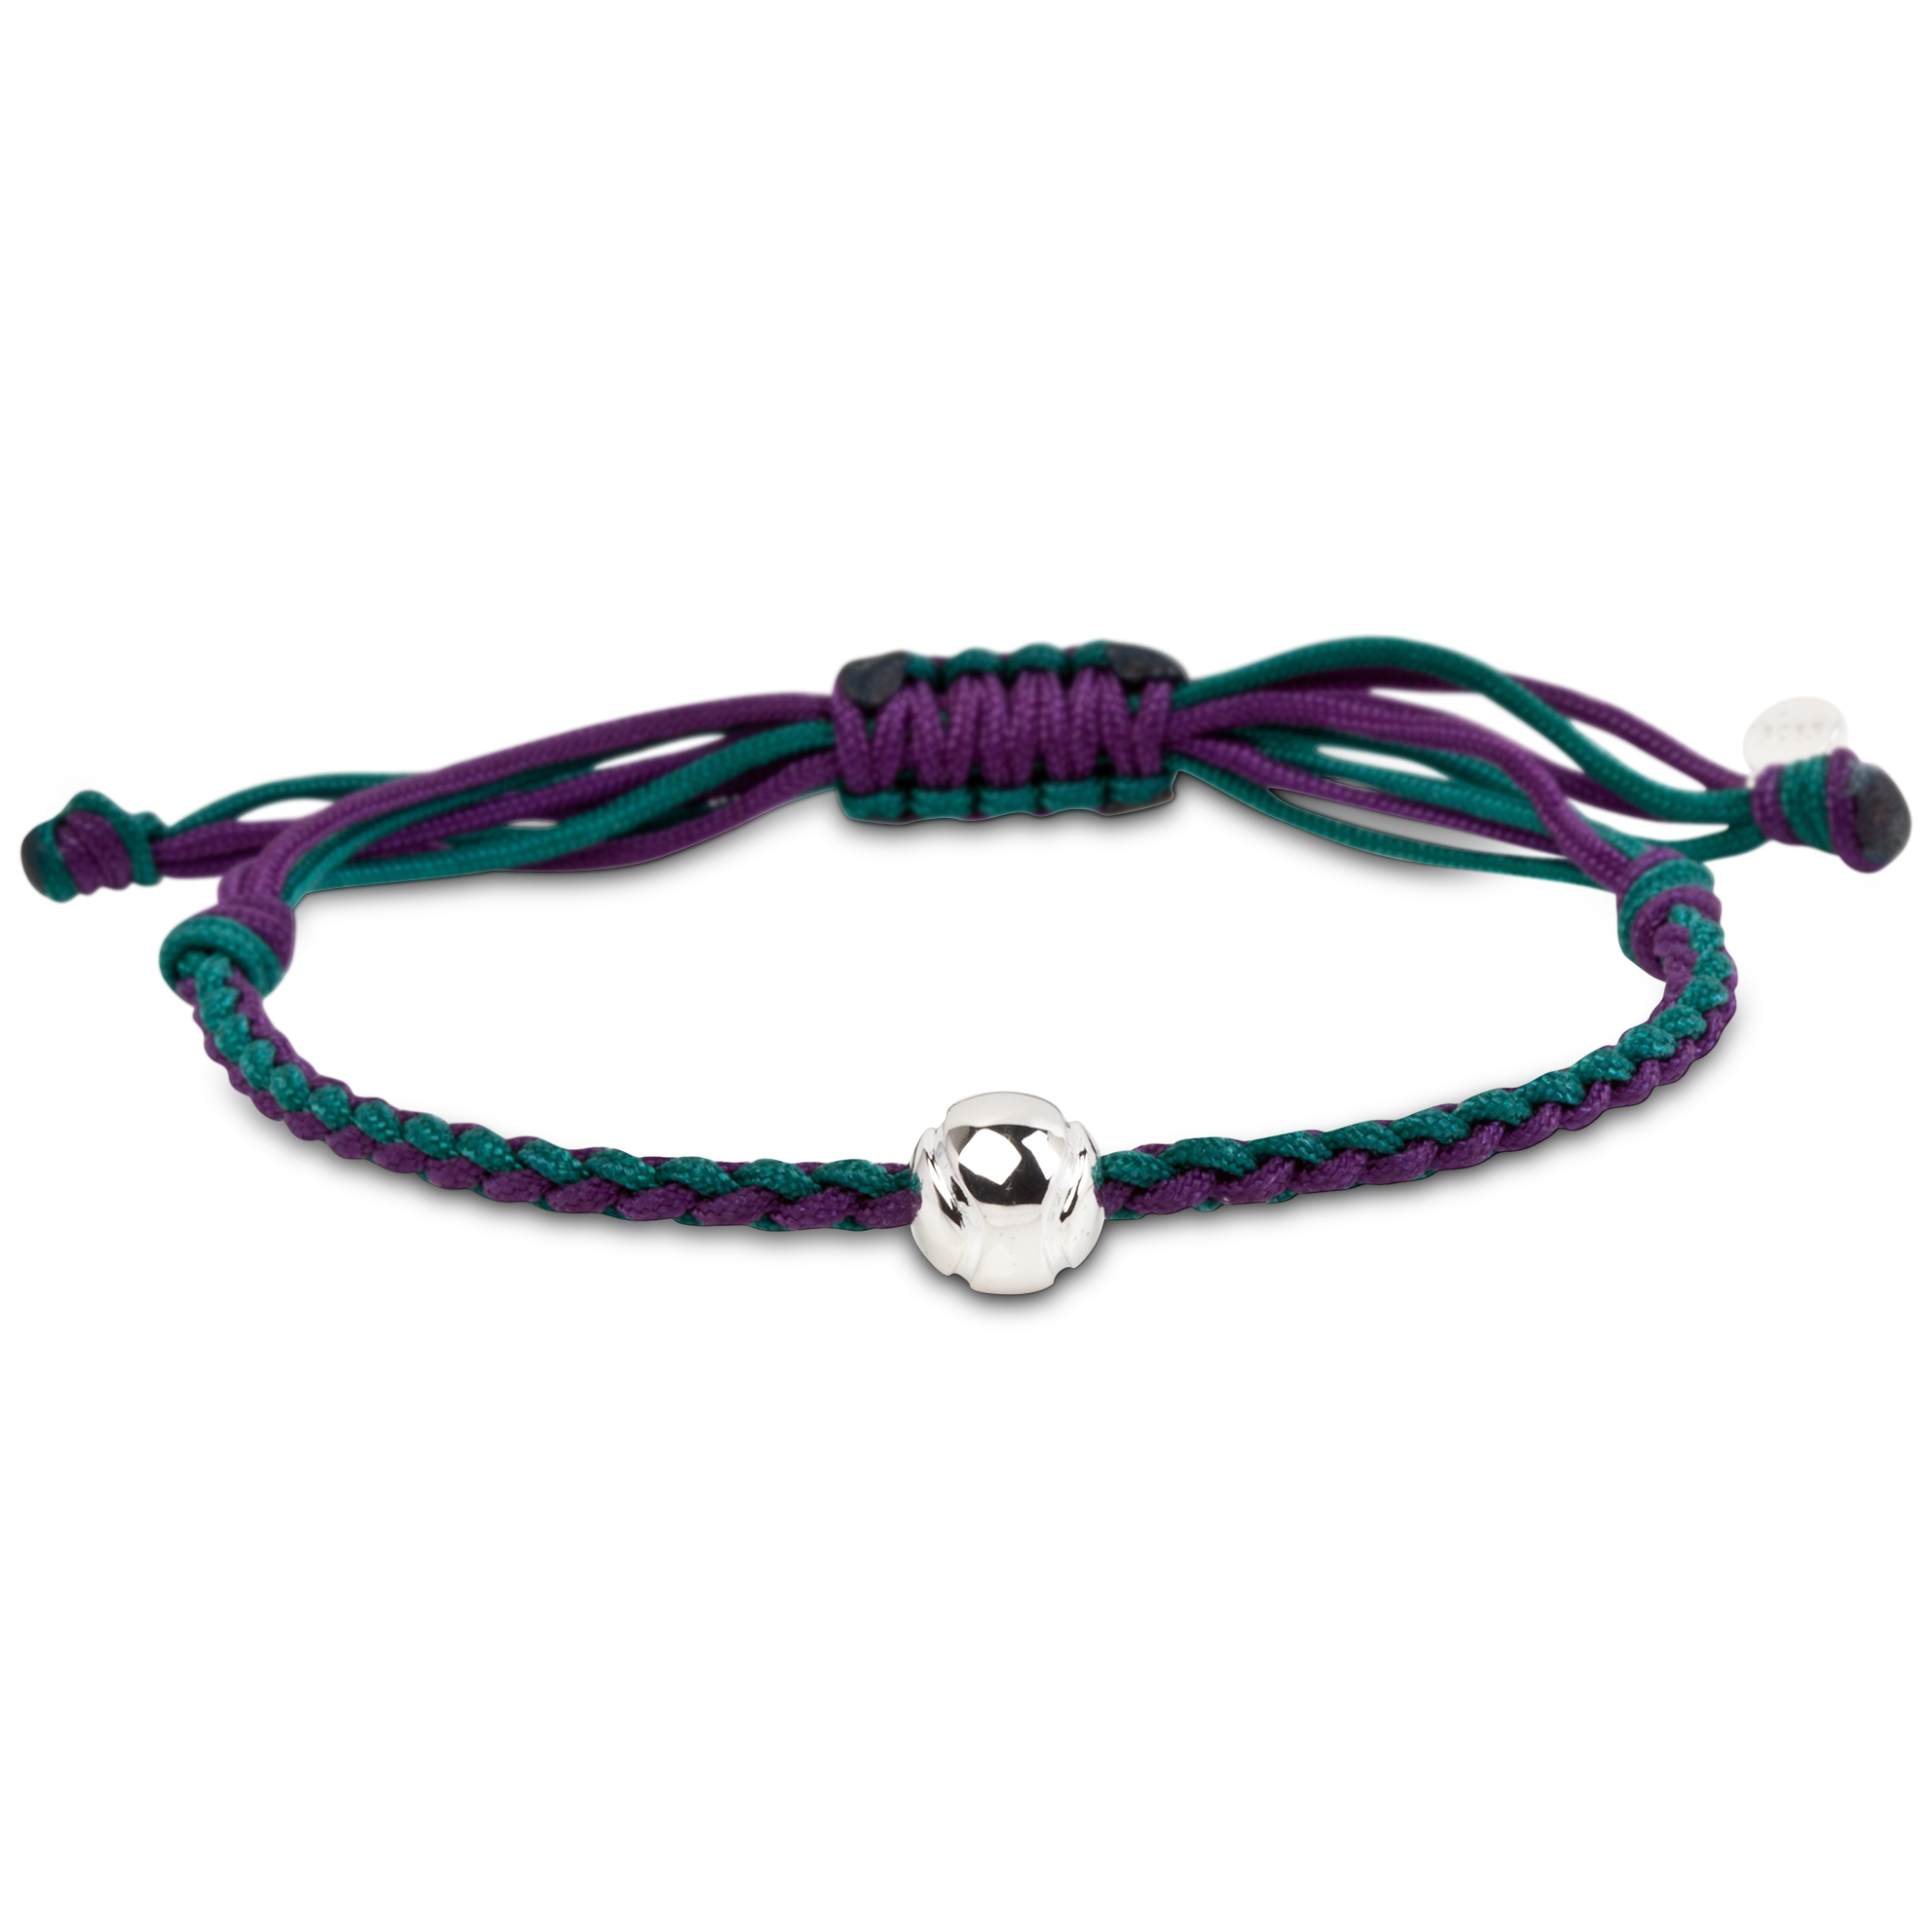 Wimbledon Ball Cord Bracelet